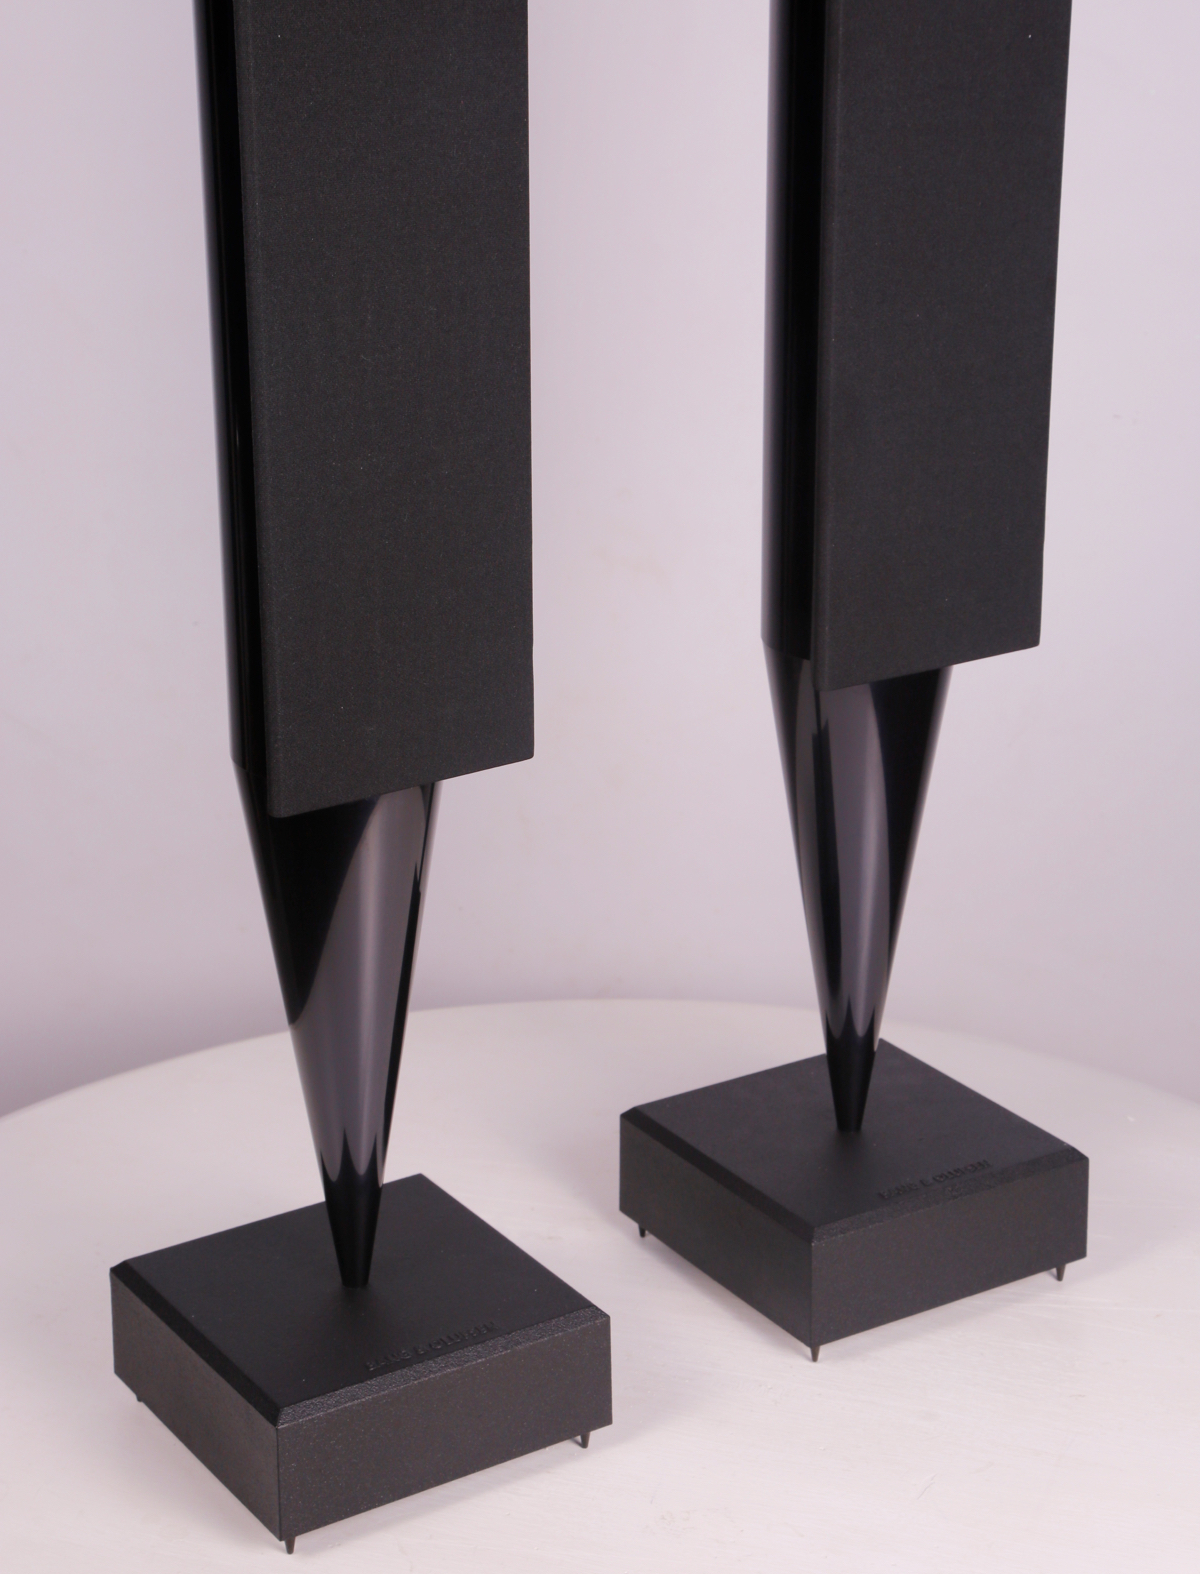 Pre-owned BeoLab 8000 Black Speakers